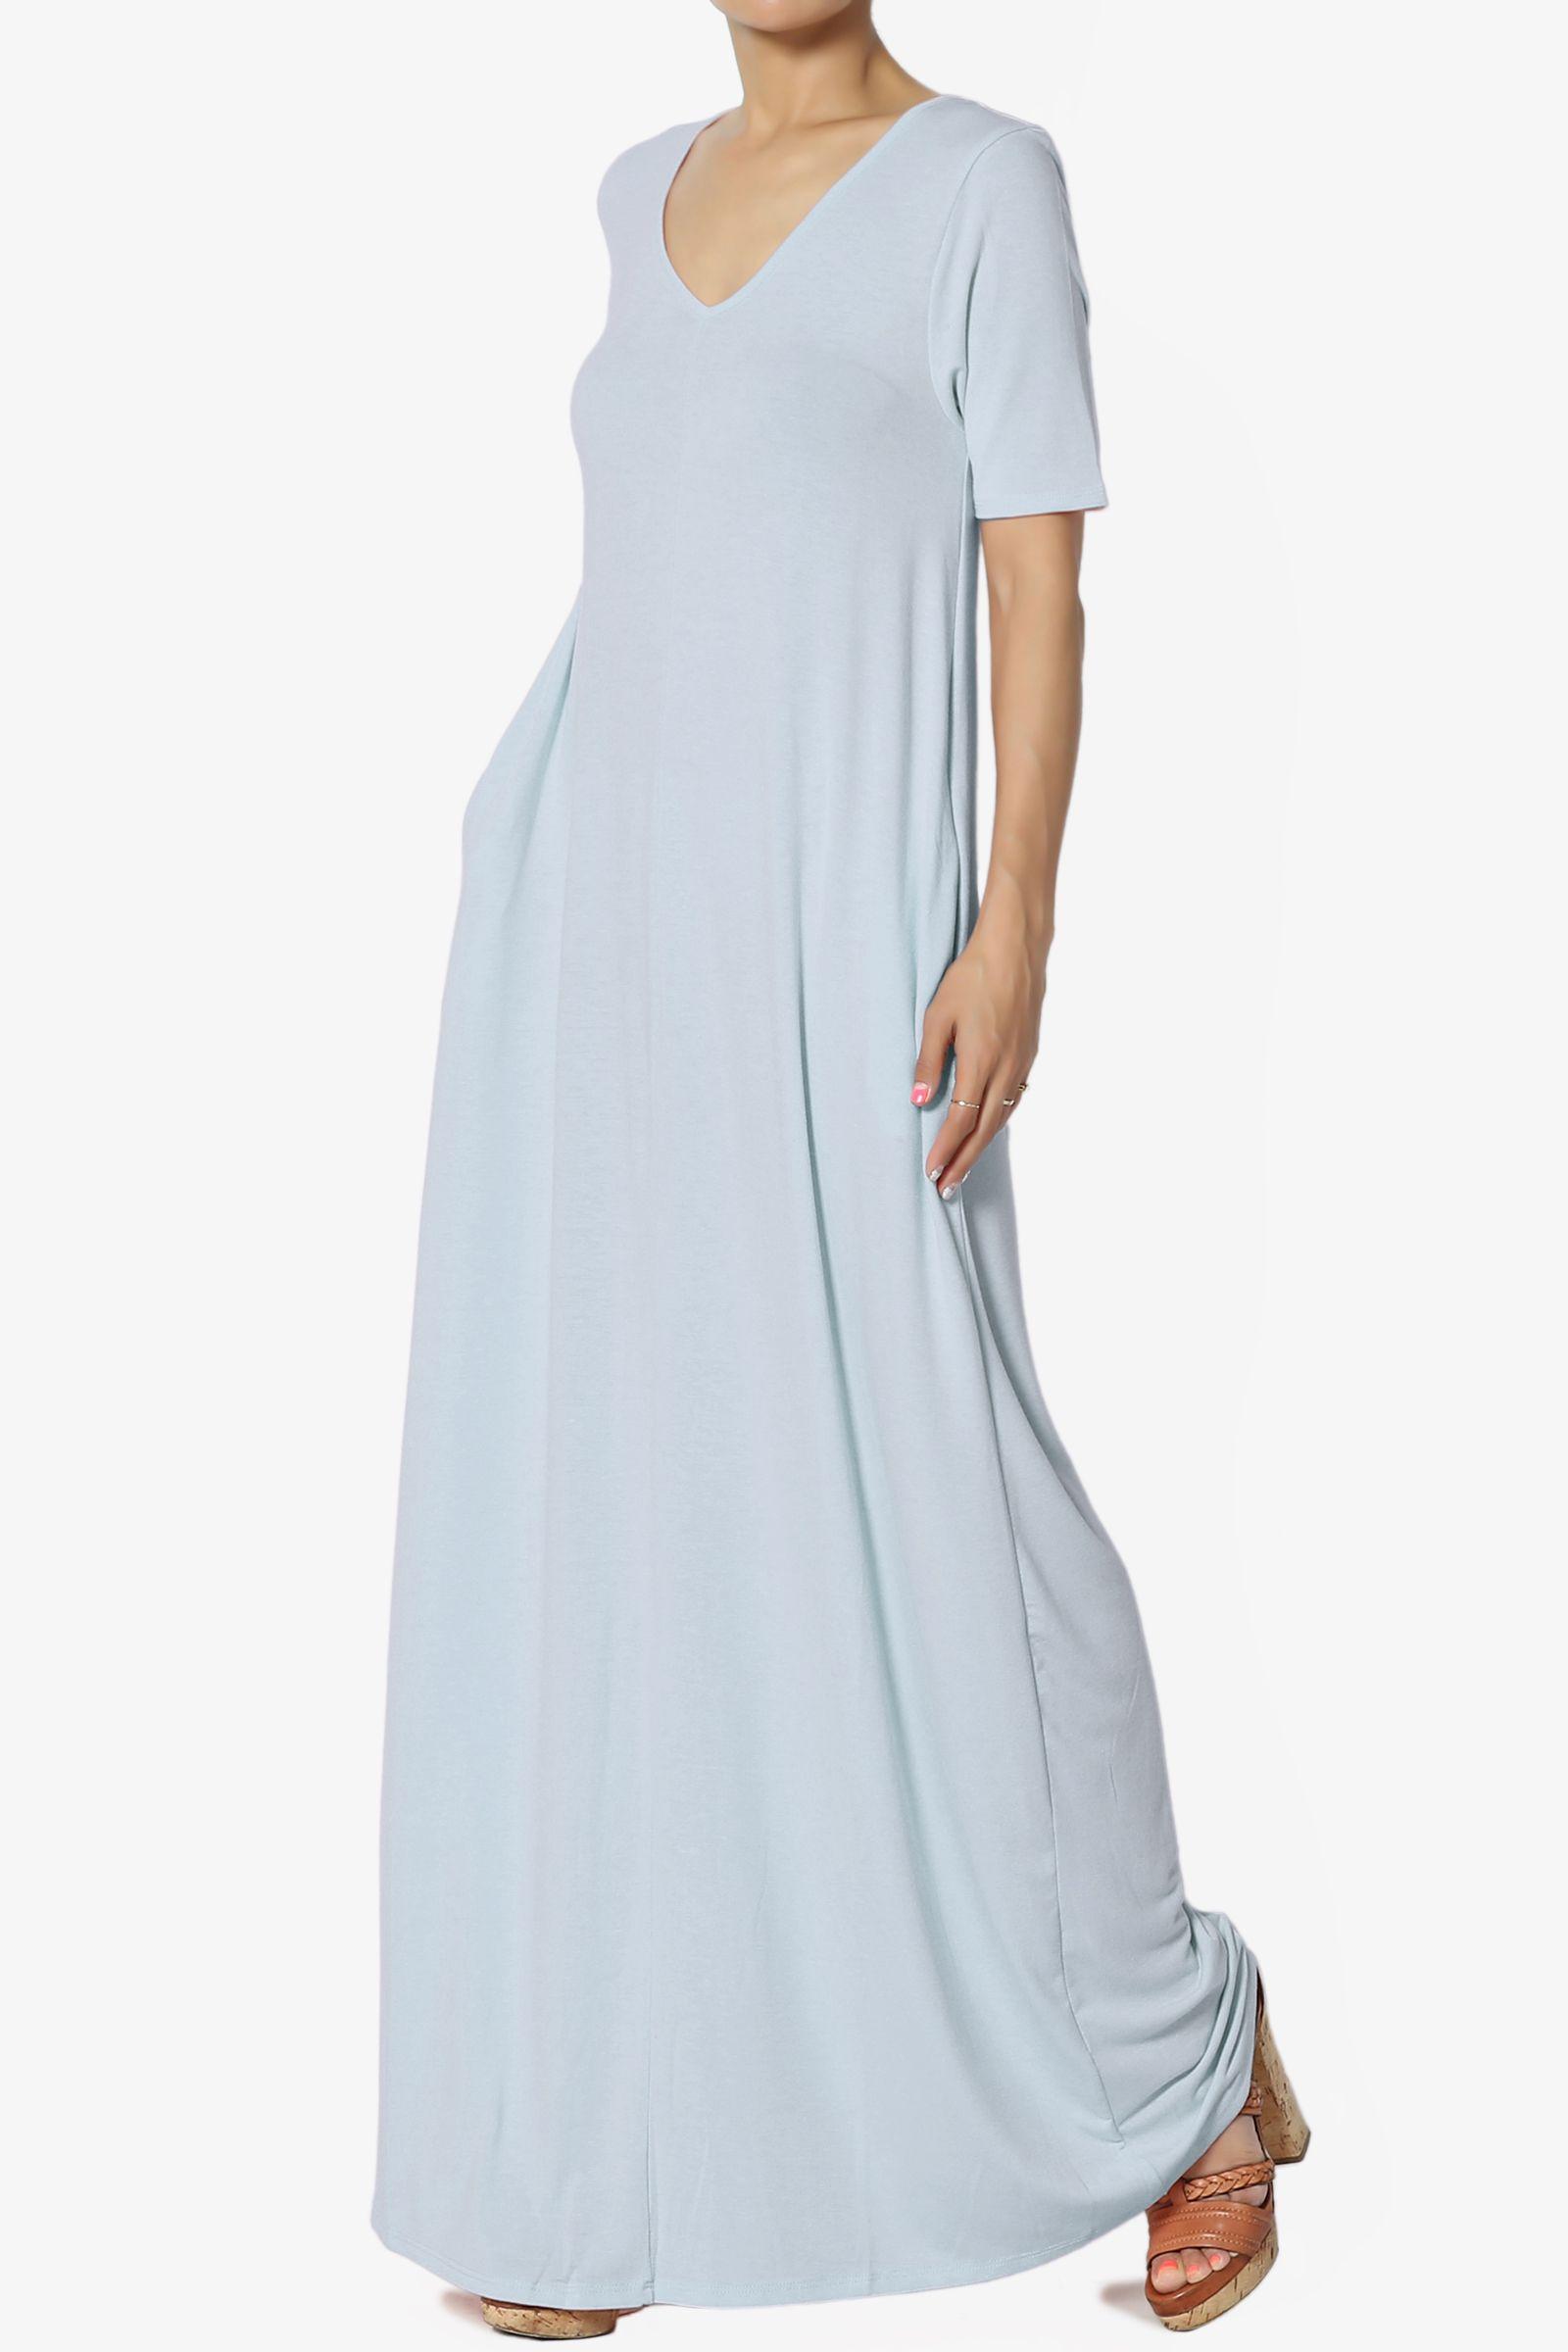 Themogan Women S S 3x Soft Jersey Oversized V Neck Short Sleeve Maxi Dress W Pocket Ad Je Maxi Dress With Sleeves Short Sleeve Maxi Dresses Maxi Jersey Dress [ 2400 x 1600 Pixel ]